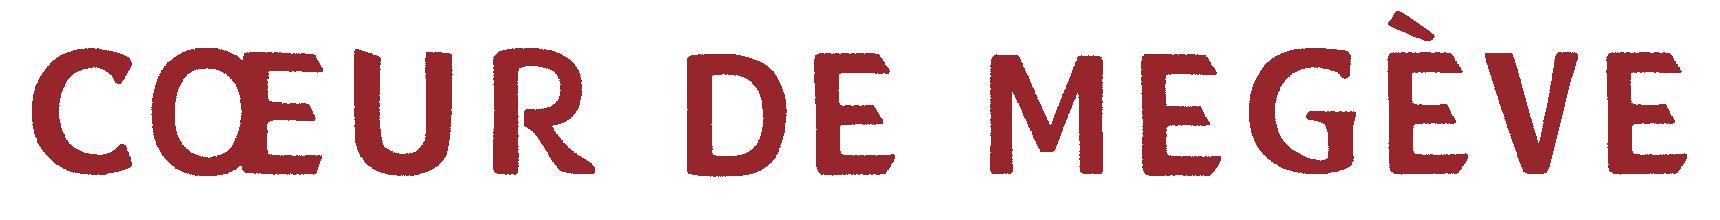 Logo Coeur de Megève